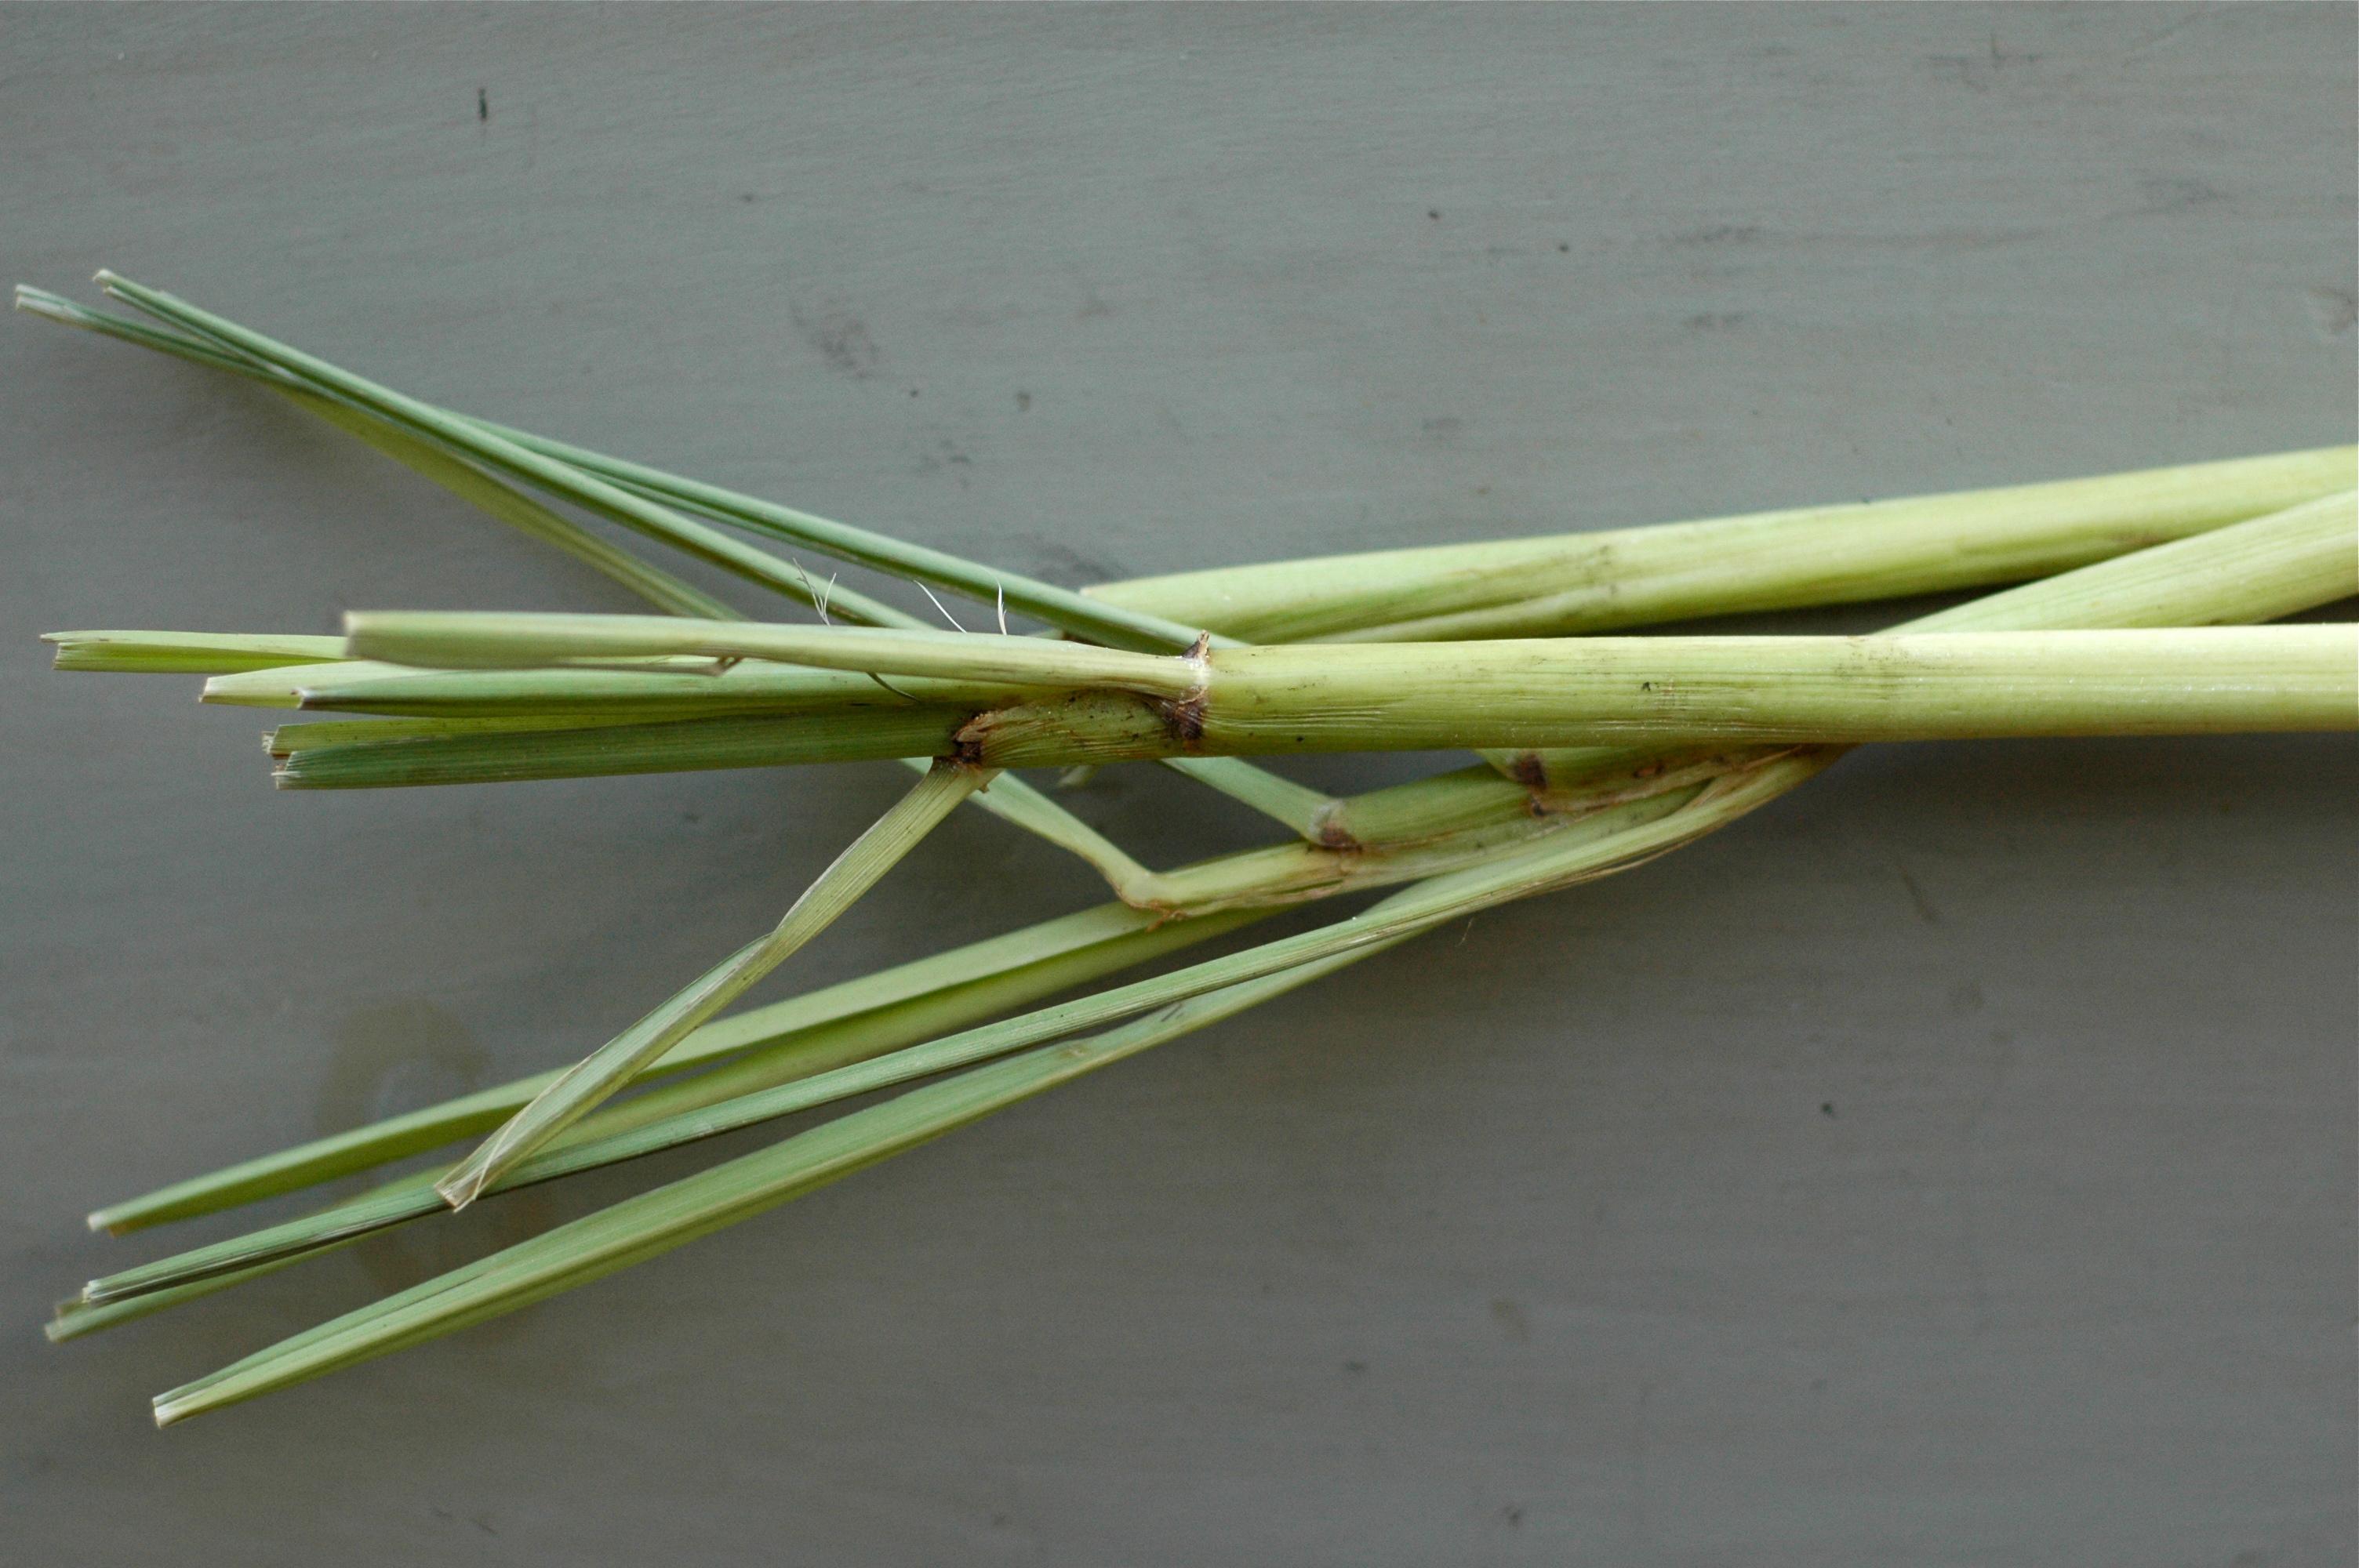 lemongrass // Delightful Crumb